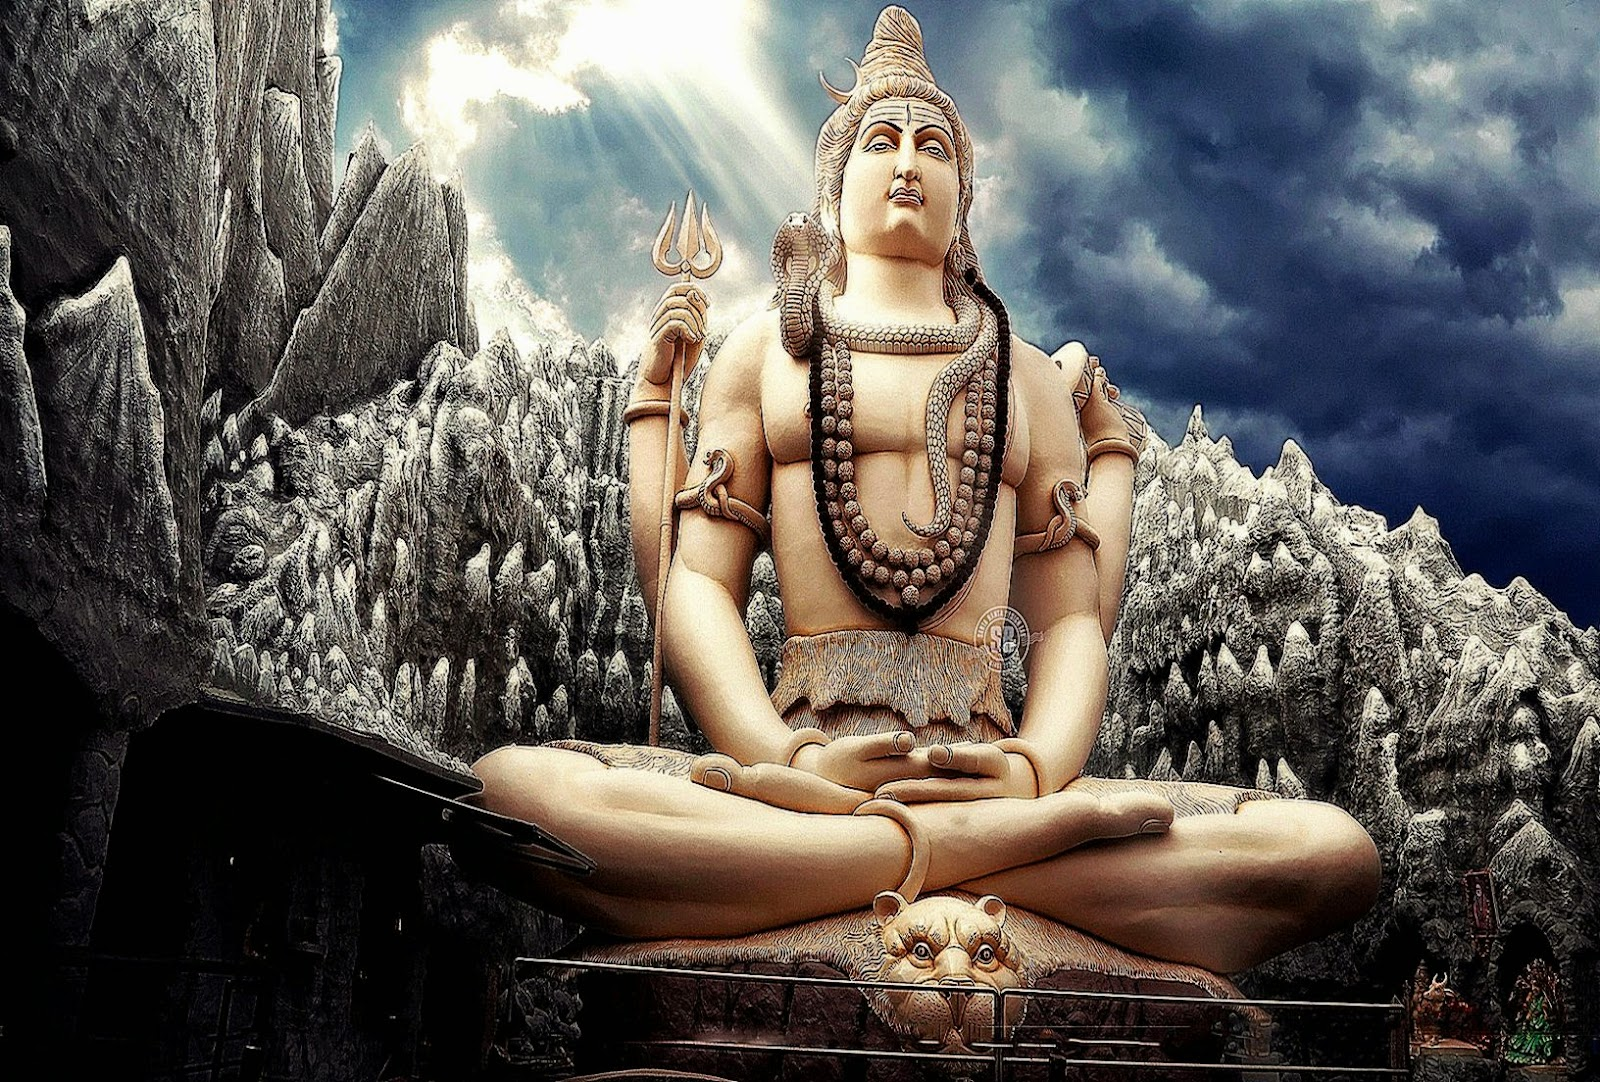 Lord Buddha 3d Live Wallpaper Lord Shiva Wallpaper Hd Cool Hd Wallpapers